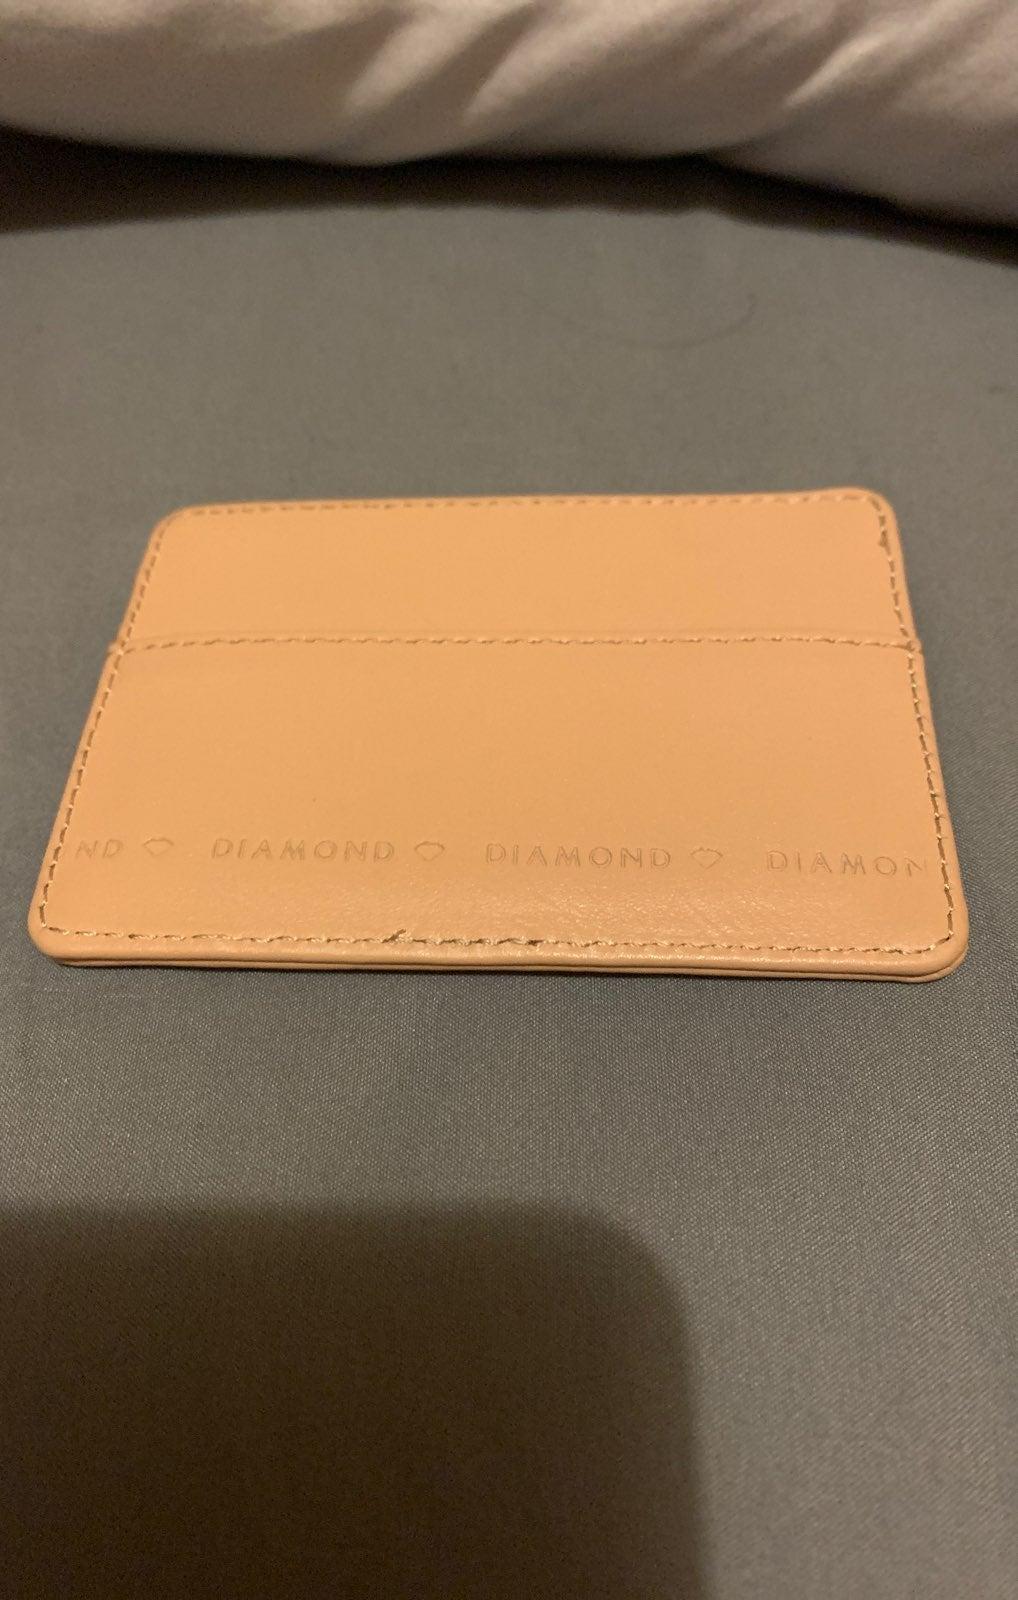 Diamond Supply Co Card Holder